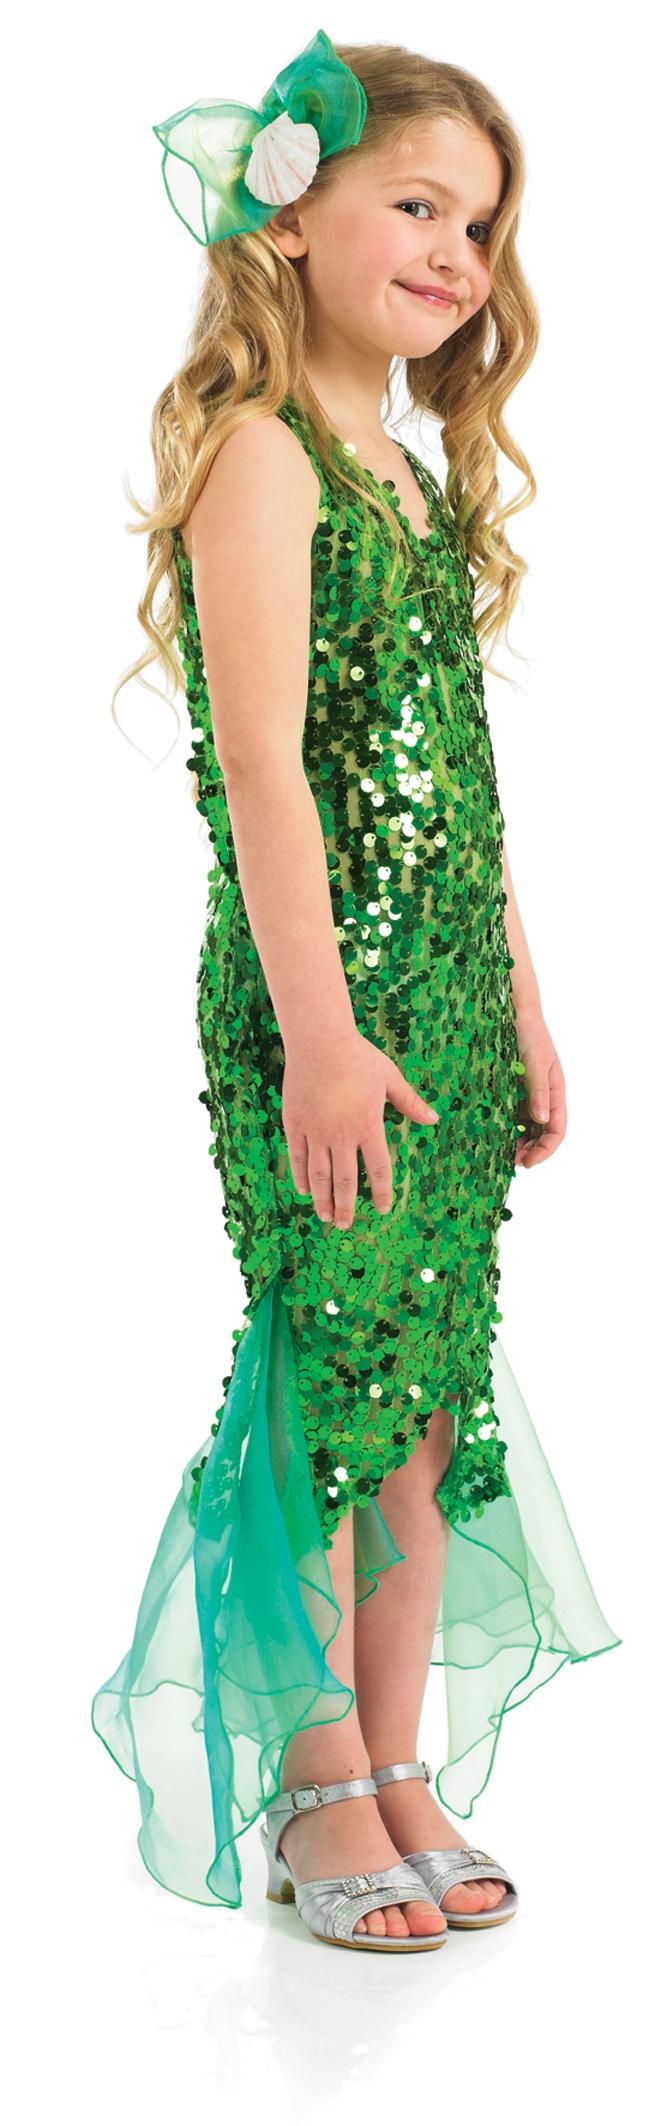 Sentinel Mermaid Princess Girls Fancy Dress Fairy Tale Book Week Childrens Kids Costumes  sc 1 st  eBay & Mermaid Princess Girls Fancy Dress Fairy Tale Book Week Childrens ...